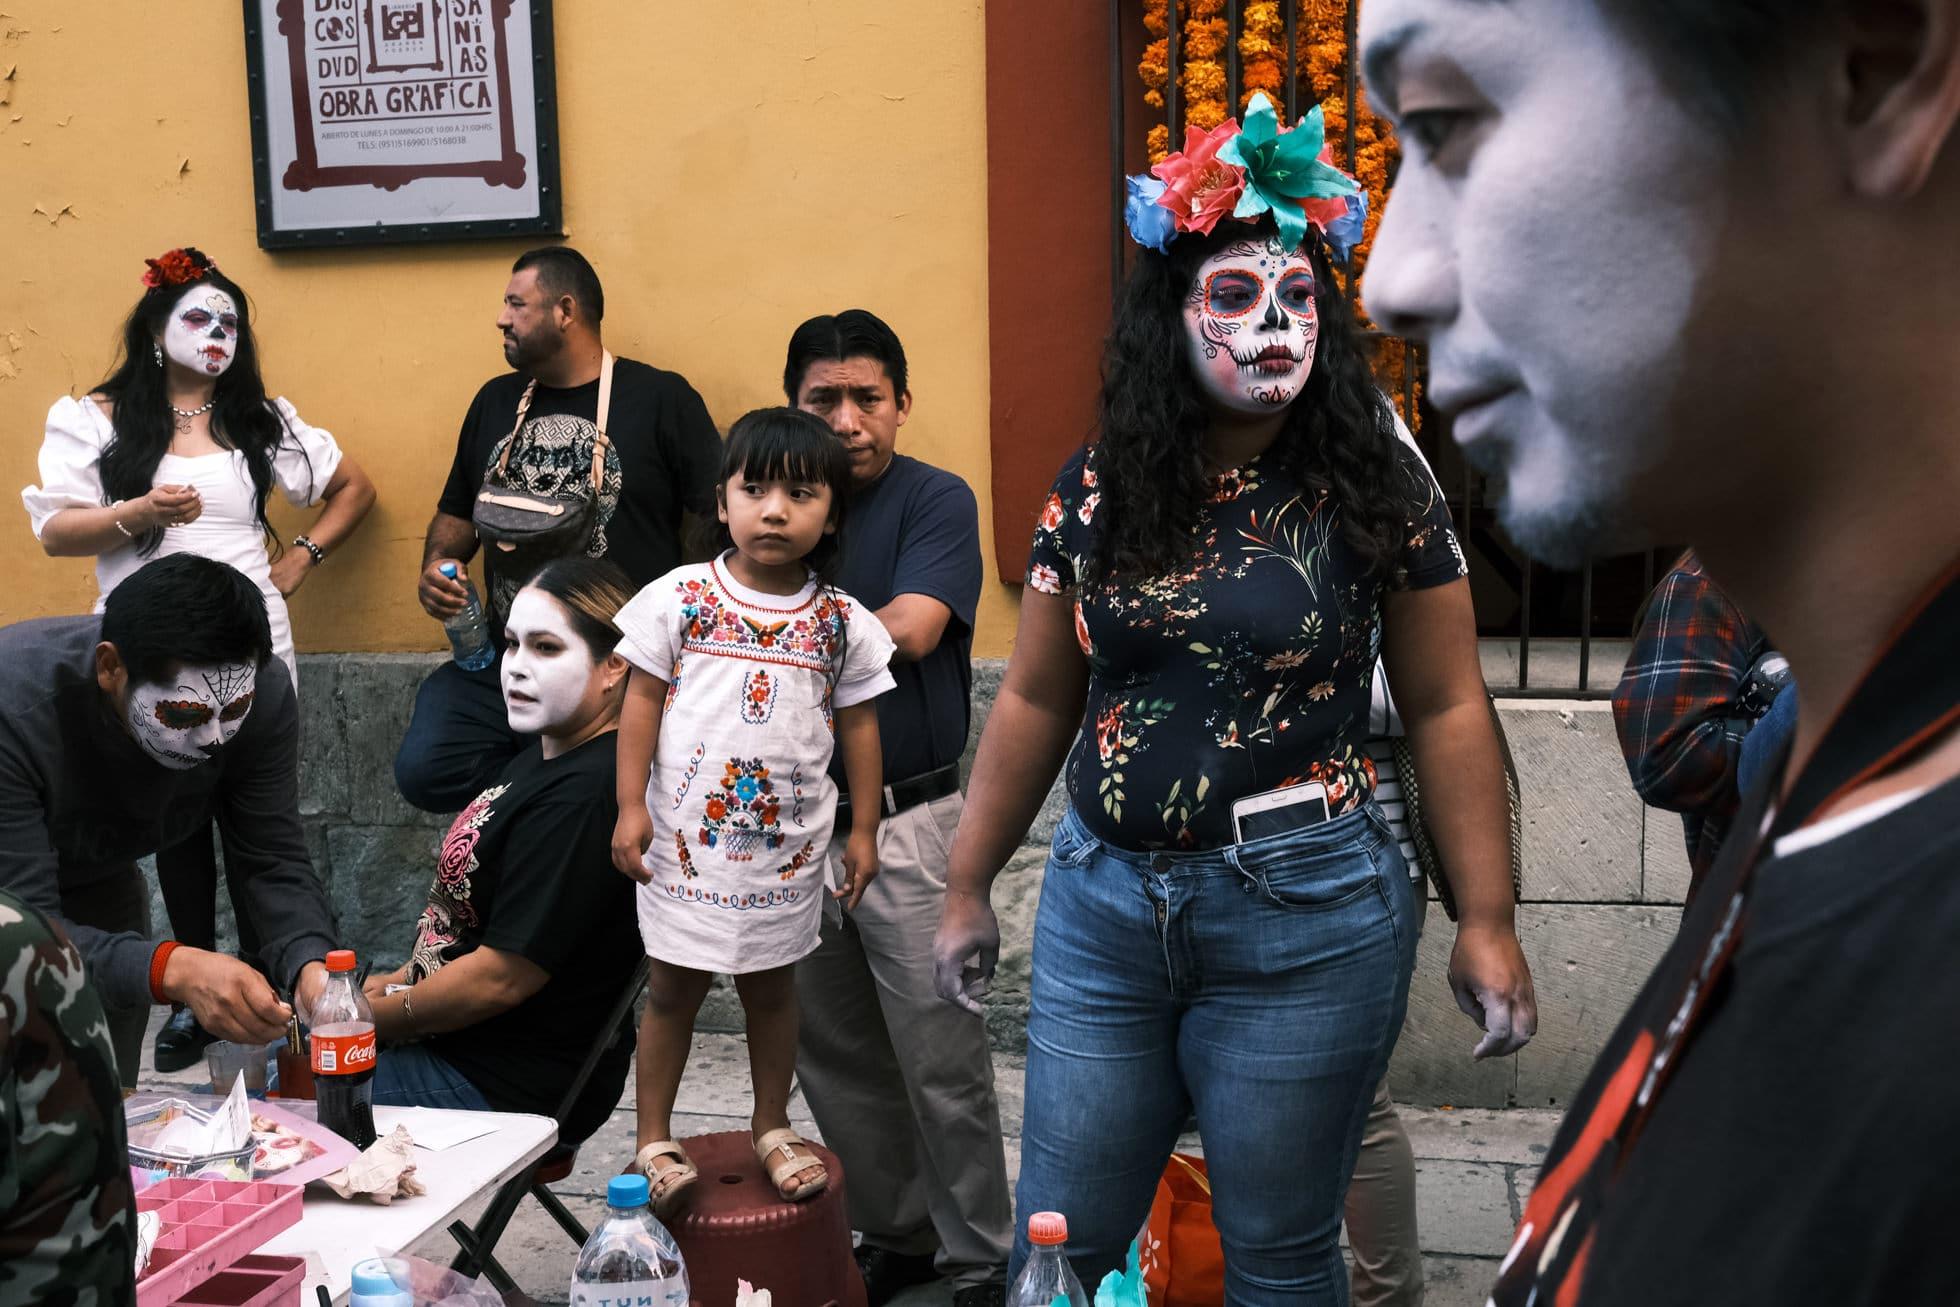 fujifilm-x-pro3-mexico-street-photography-34